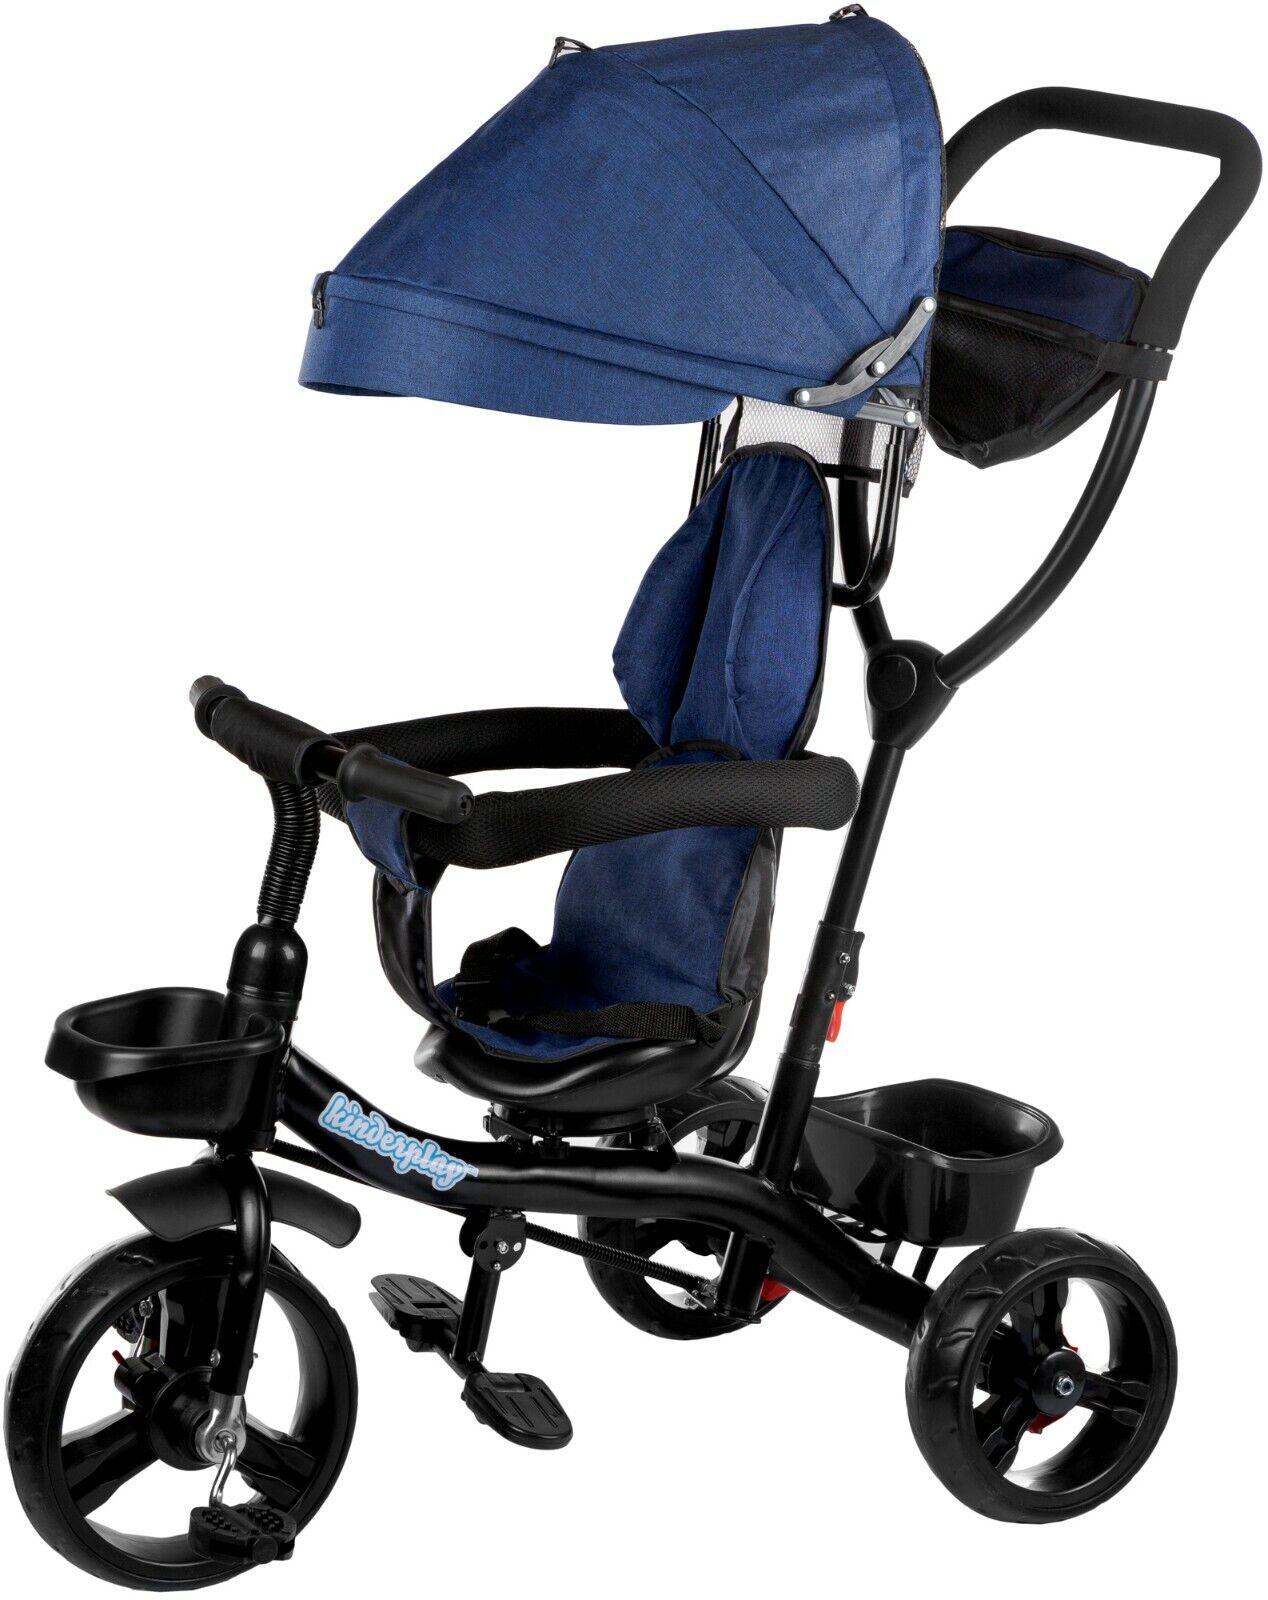 Dreirad Kinderdreirad Kinder Lenkstange Fahrrad KP0567blu Baby Kinderwagen Neu